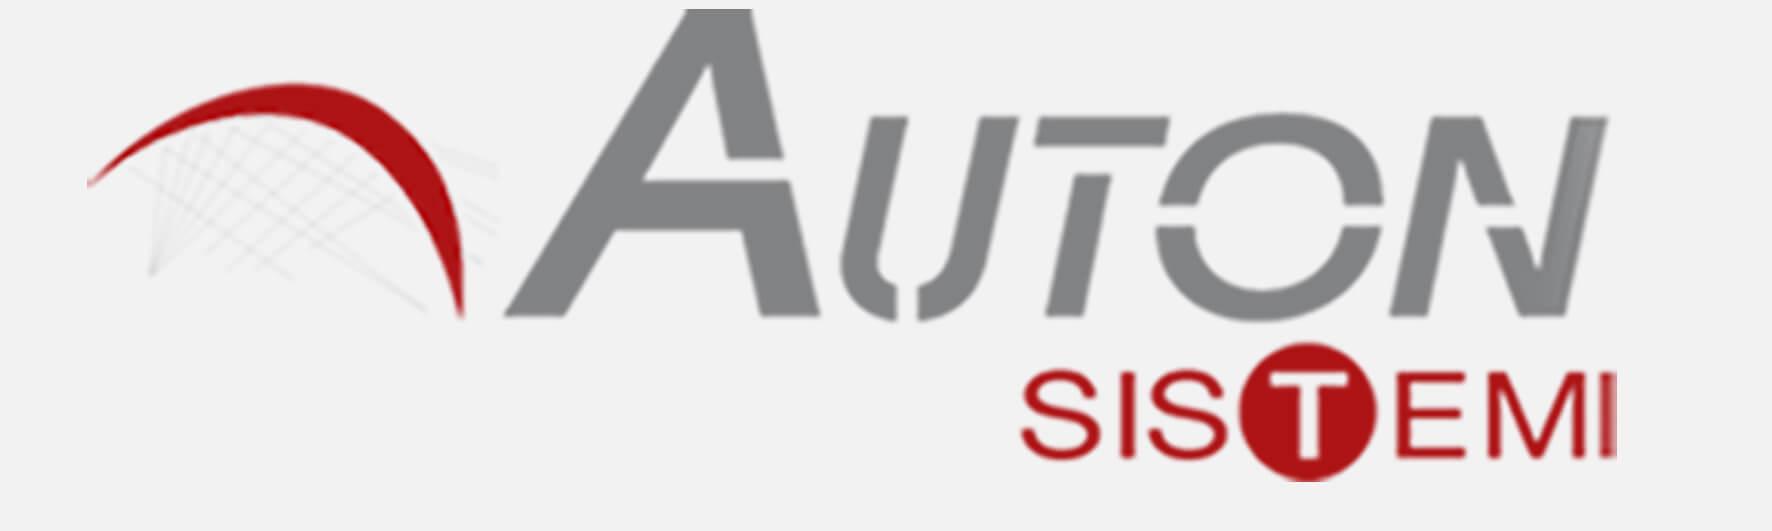 auton sistemi